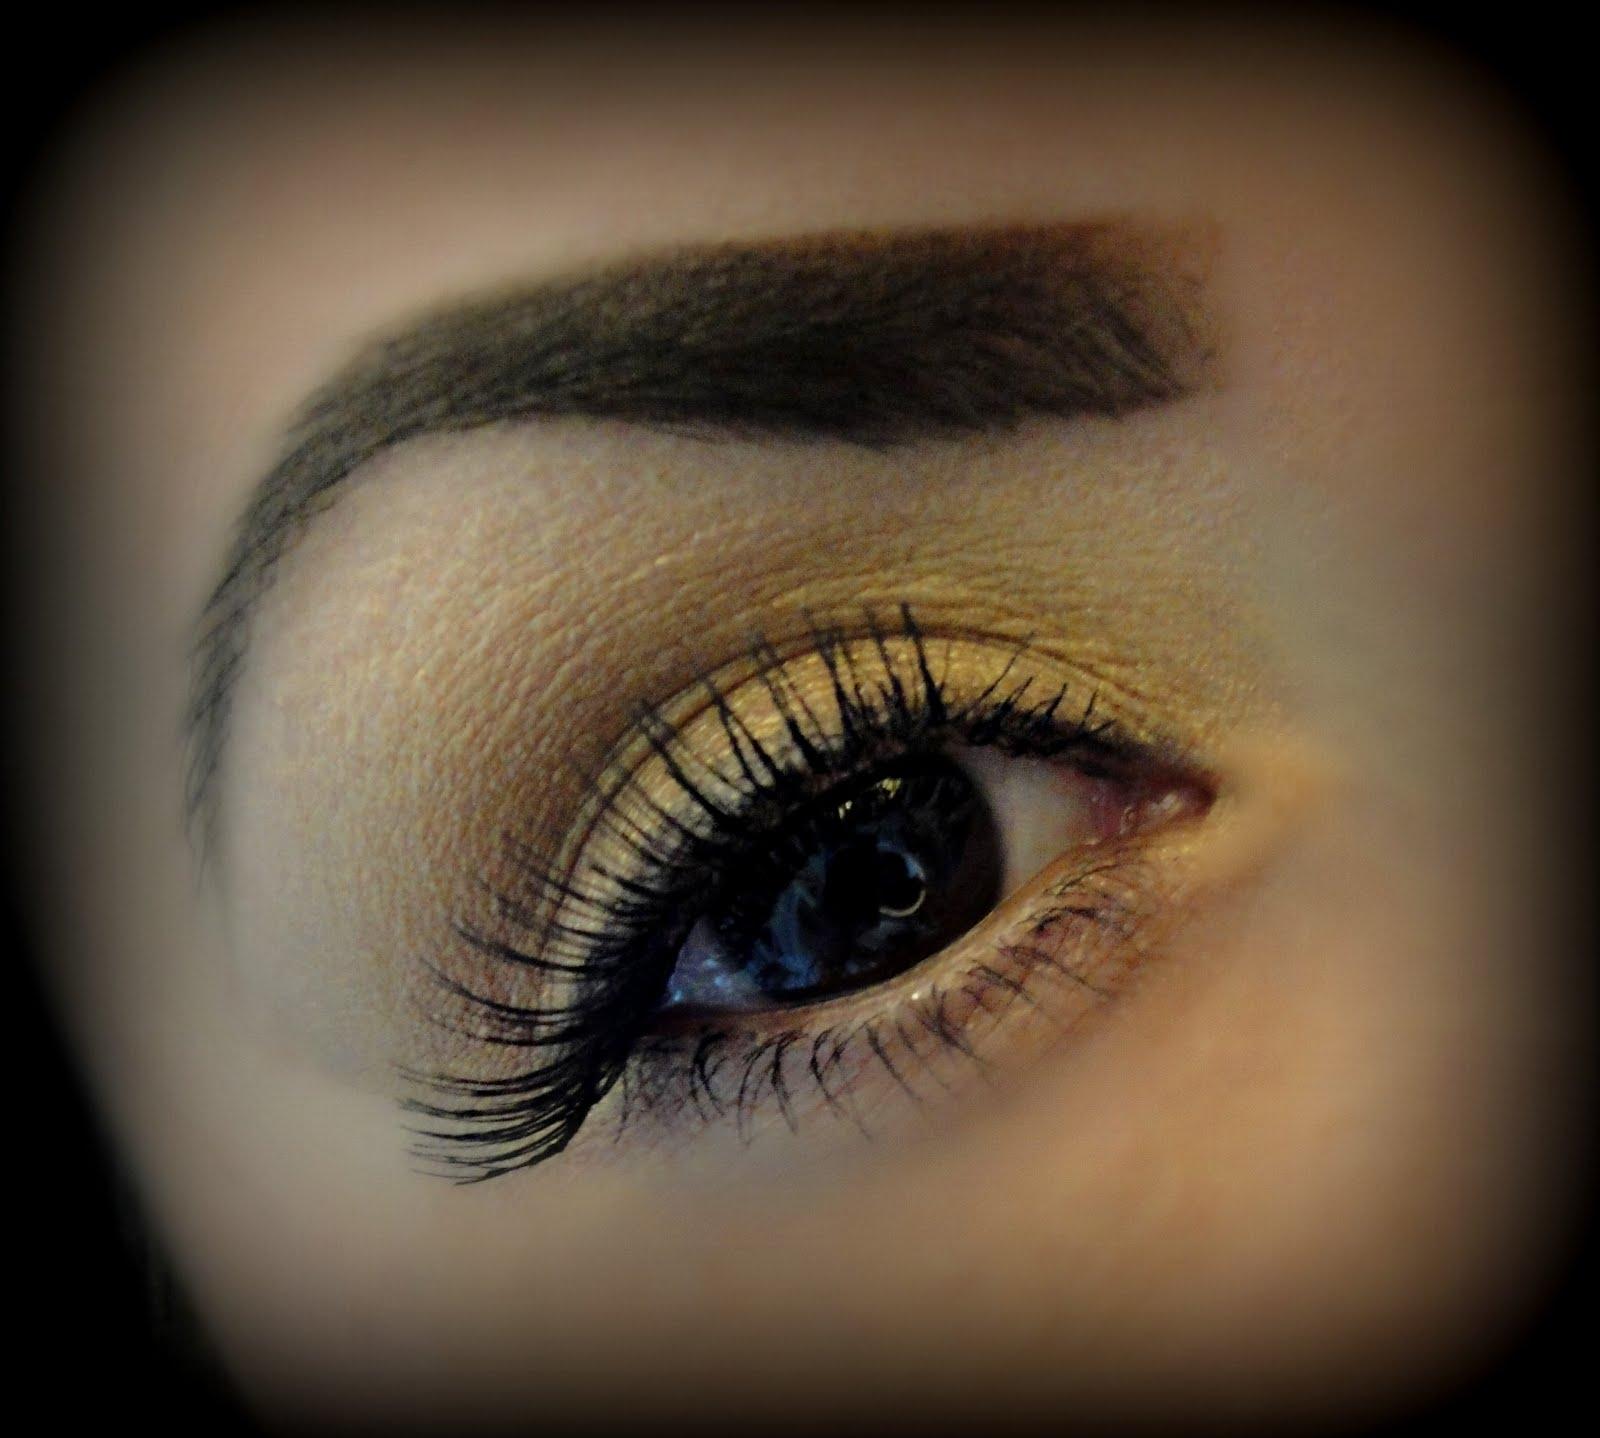 Beauty Secrets And Health Tips Eyebrows Waxing Beauty Wallpaper